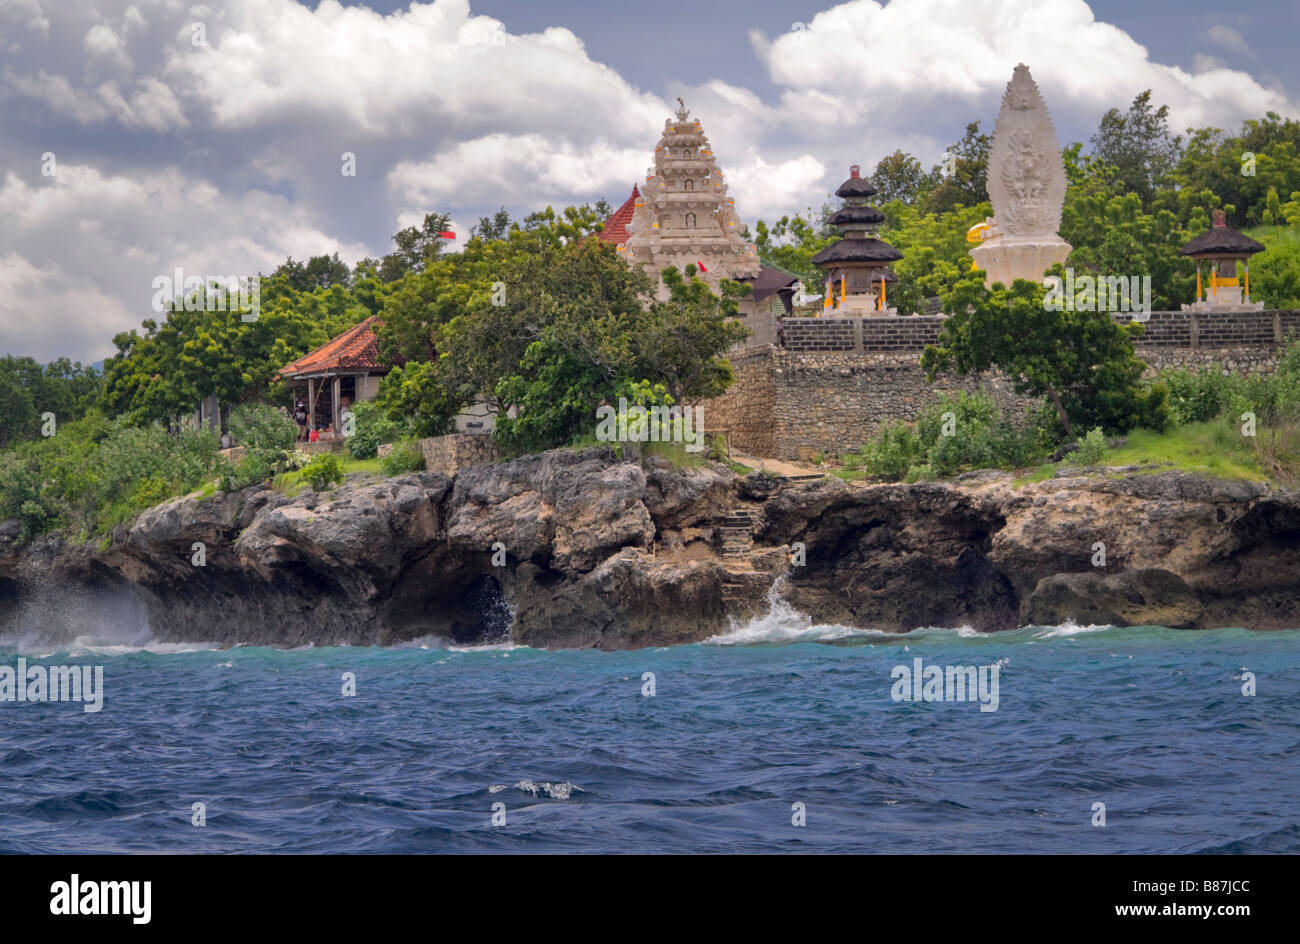 Gili Kencana Temple on the Island of Manjangan, Bali, Indonesia - Stock Image